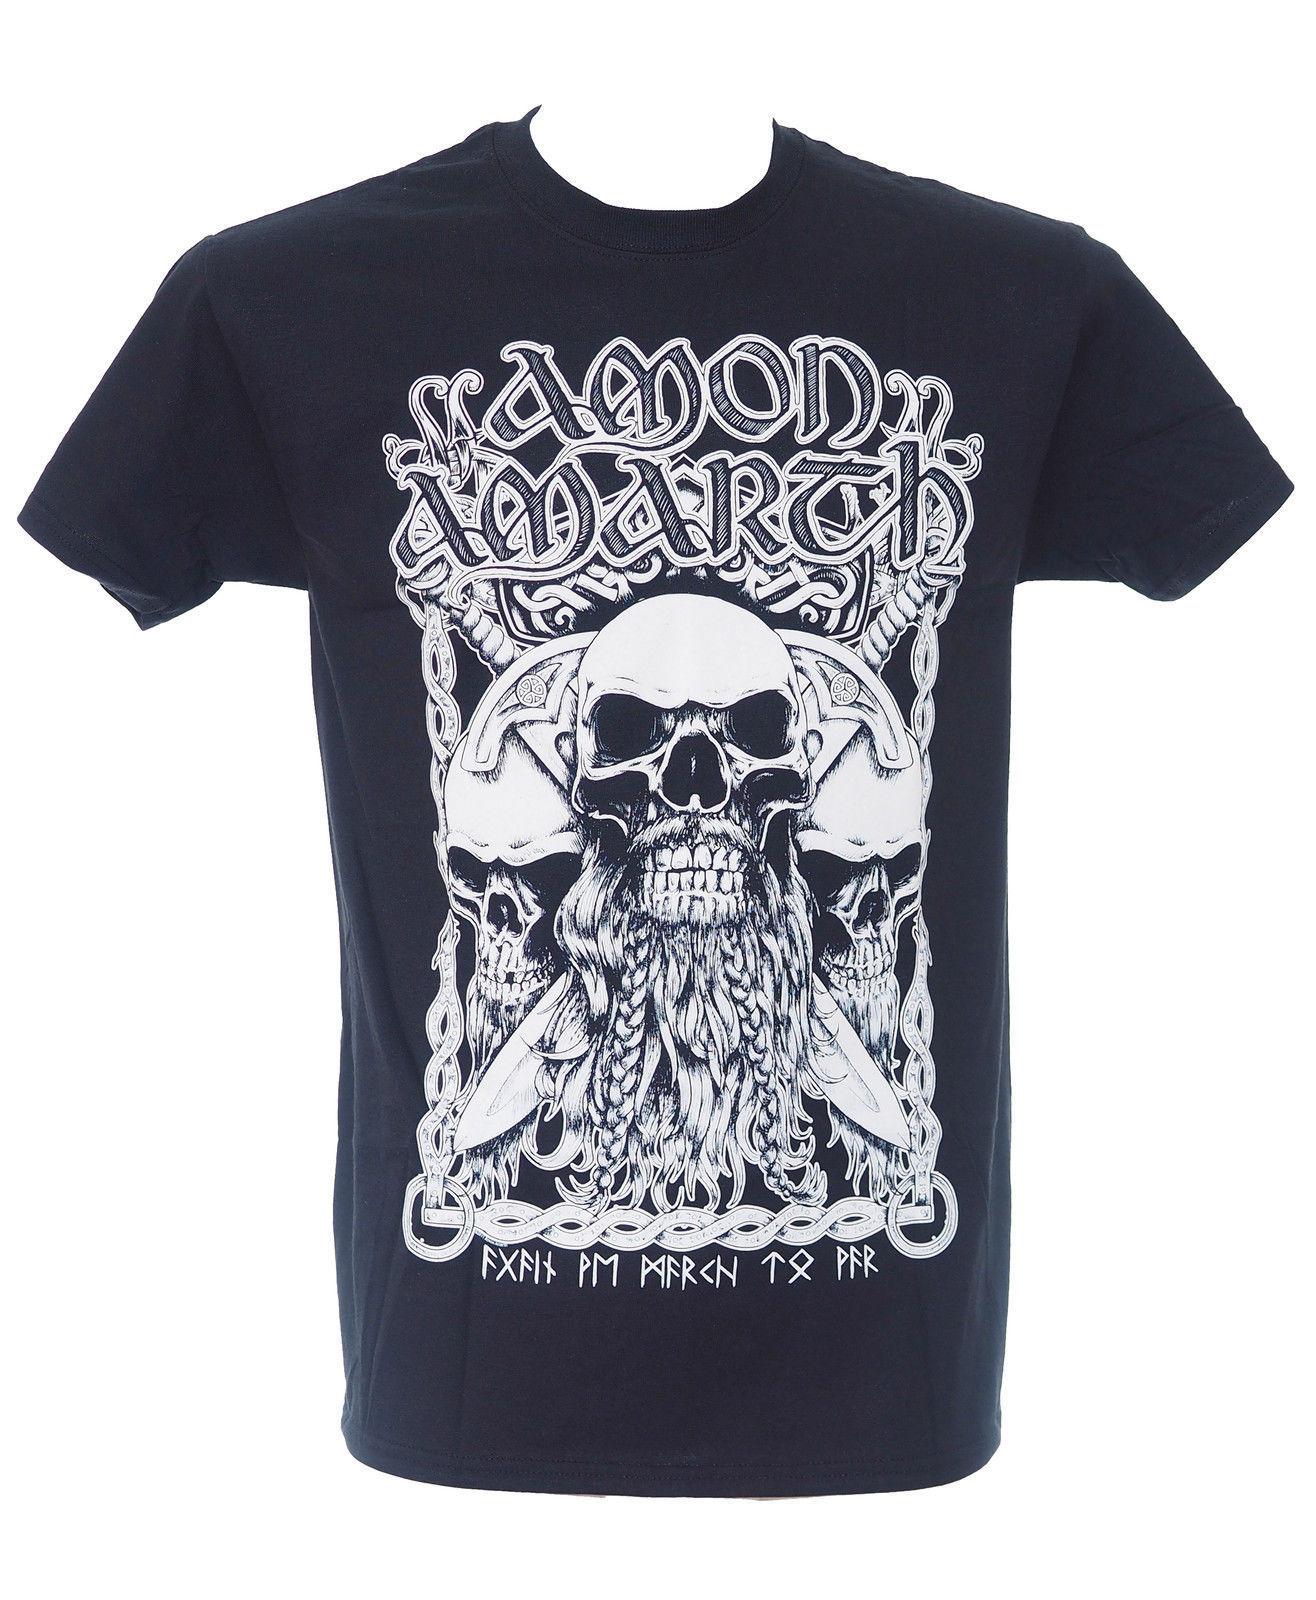 Cheap T Shirt Maker Promotion-Shop for Promotional Cheap T Shirt ...